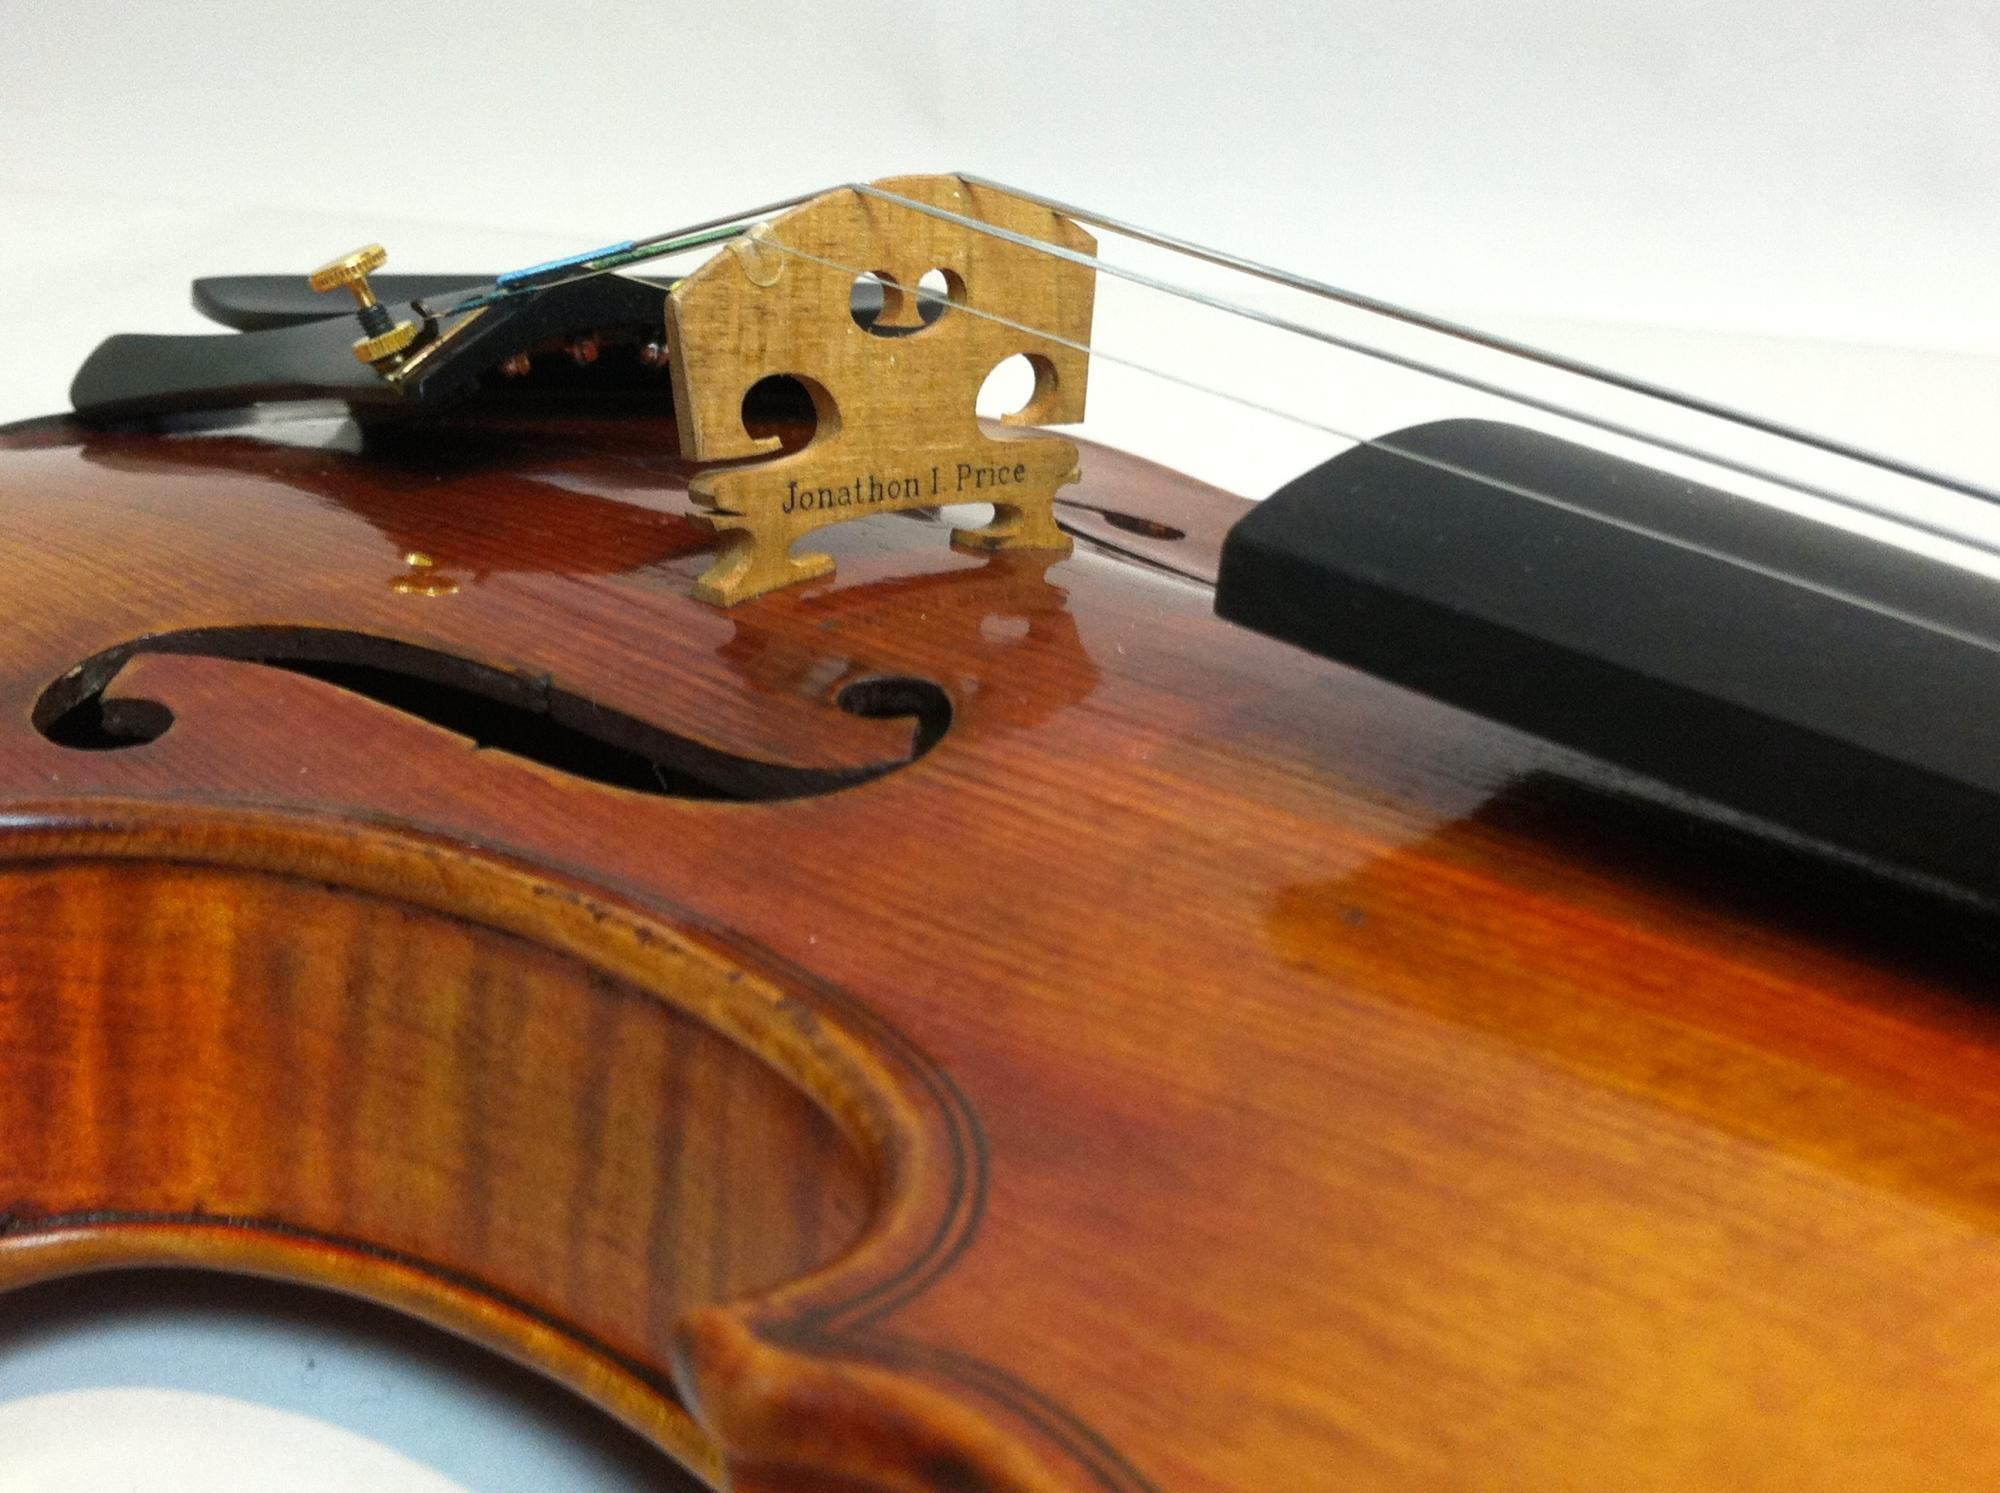 Violin by Jonathon I. Price